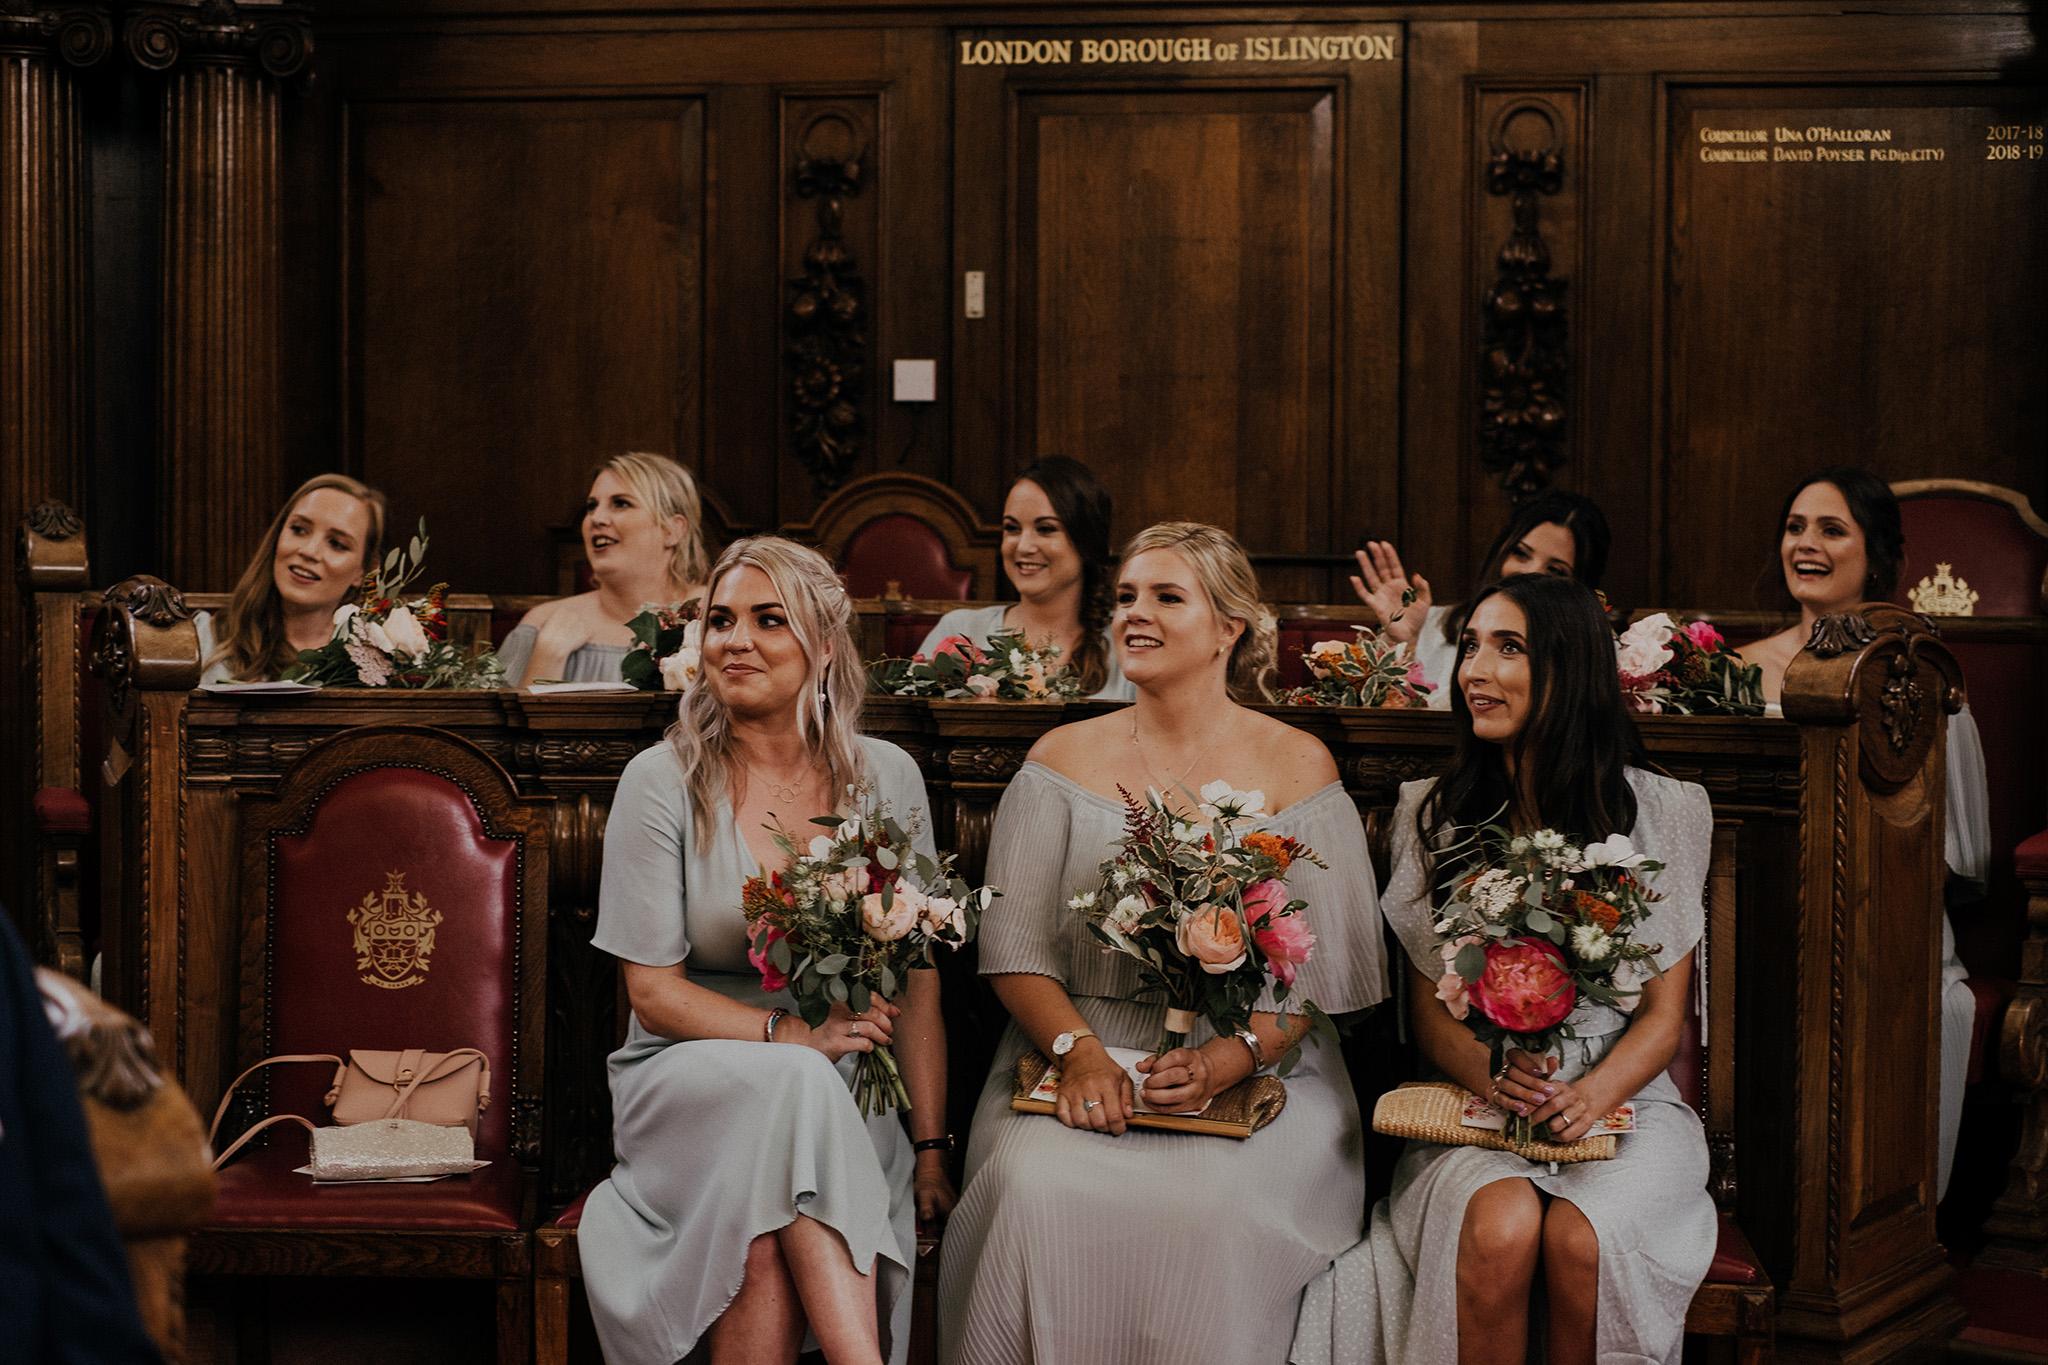 Islington-town-hall-wedding39.jpg